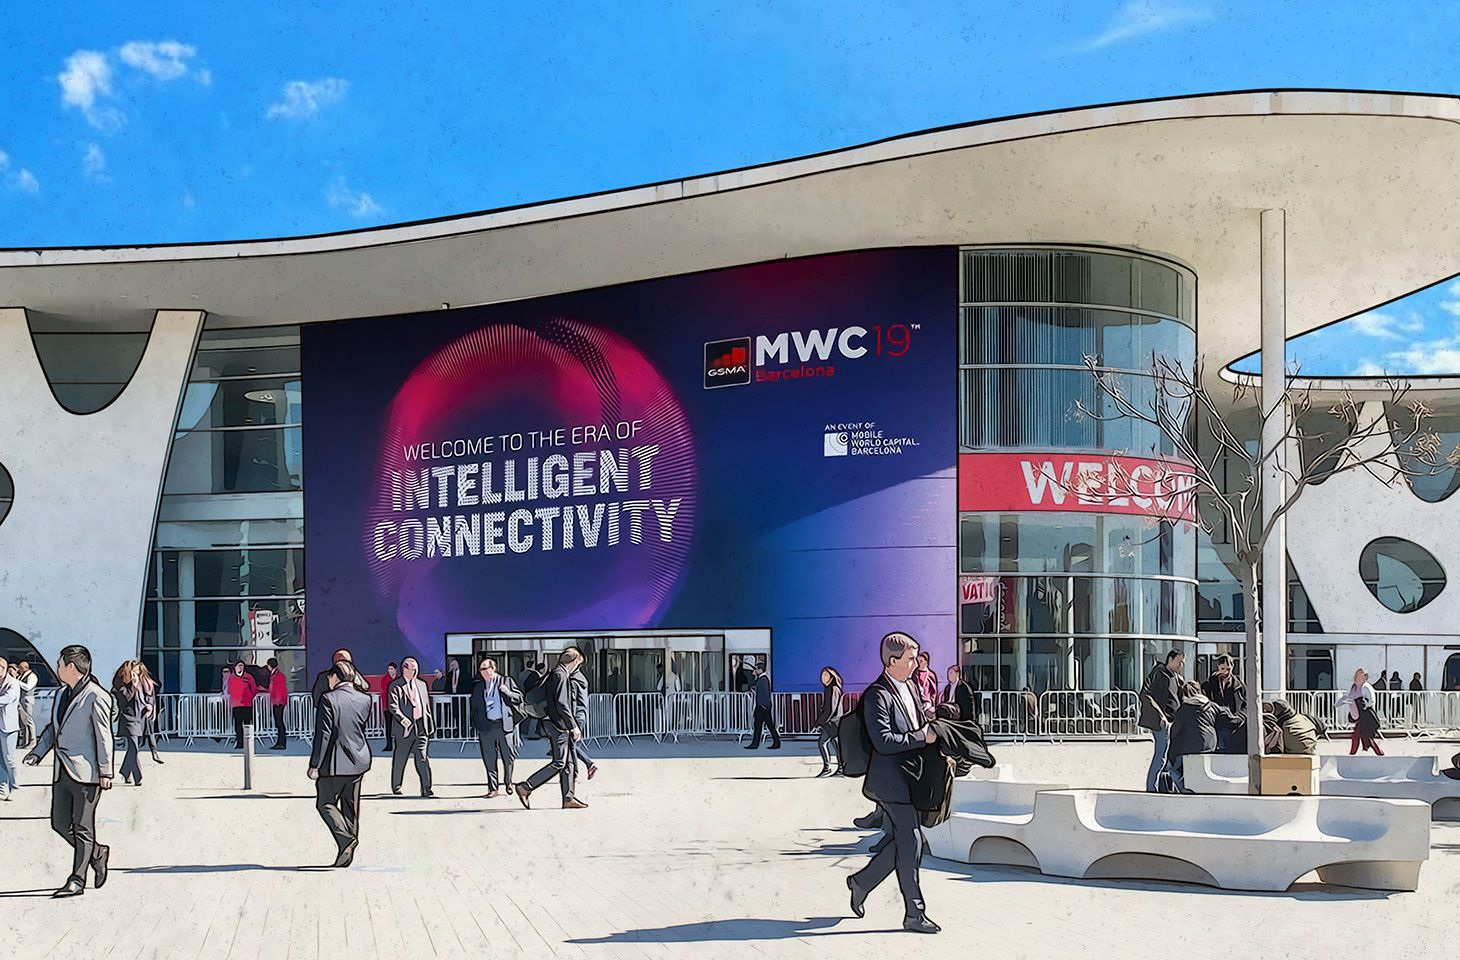 Mobile World Congress 2019 recapped: 5G, Internet of Things, ultrasonic fingerprint sensors, and artificial intelligence